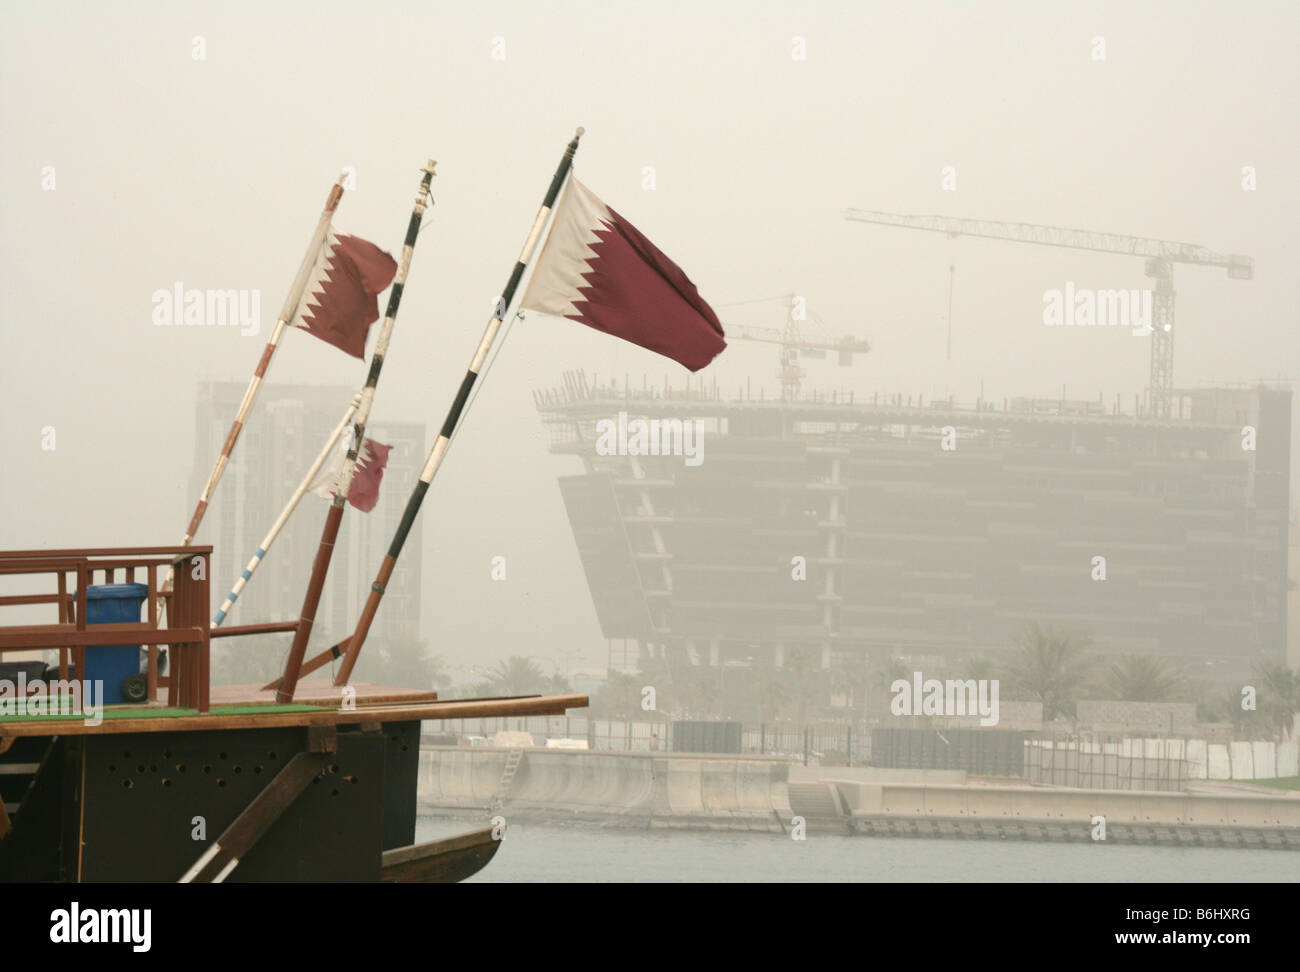 Qatari flags decorating traditional boats, Doha Bay, Qatar Stock Photo